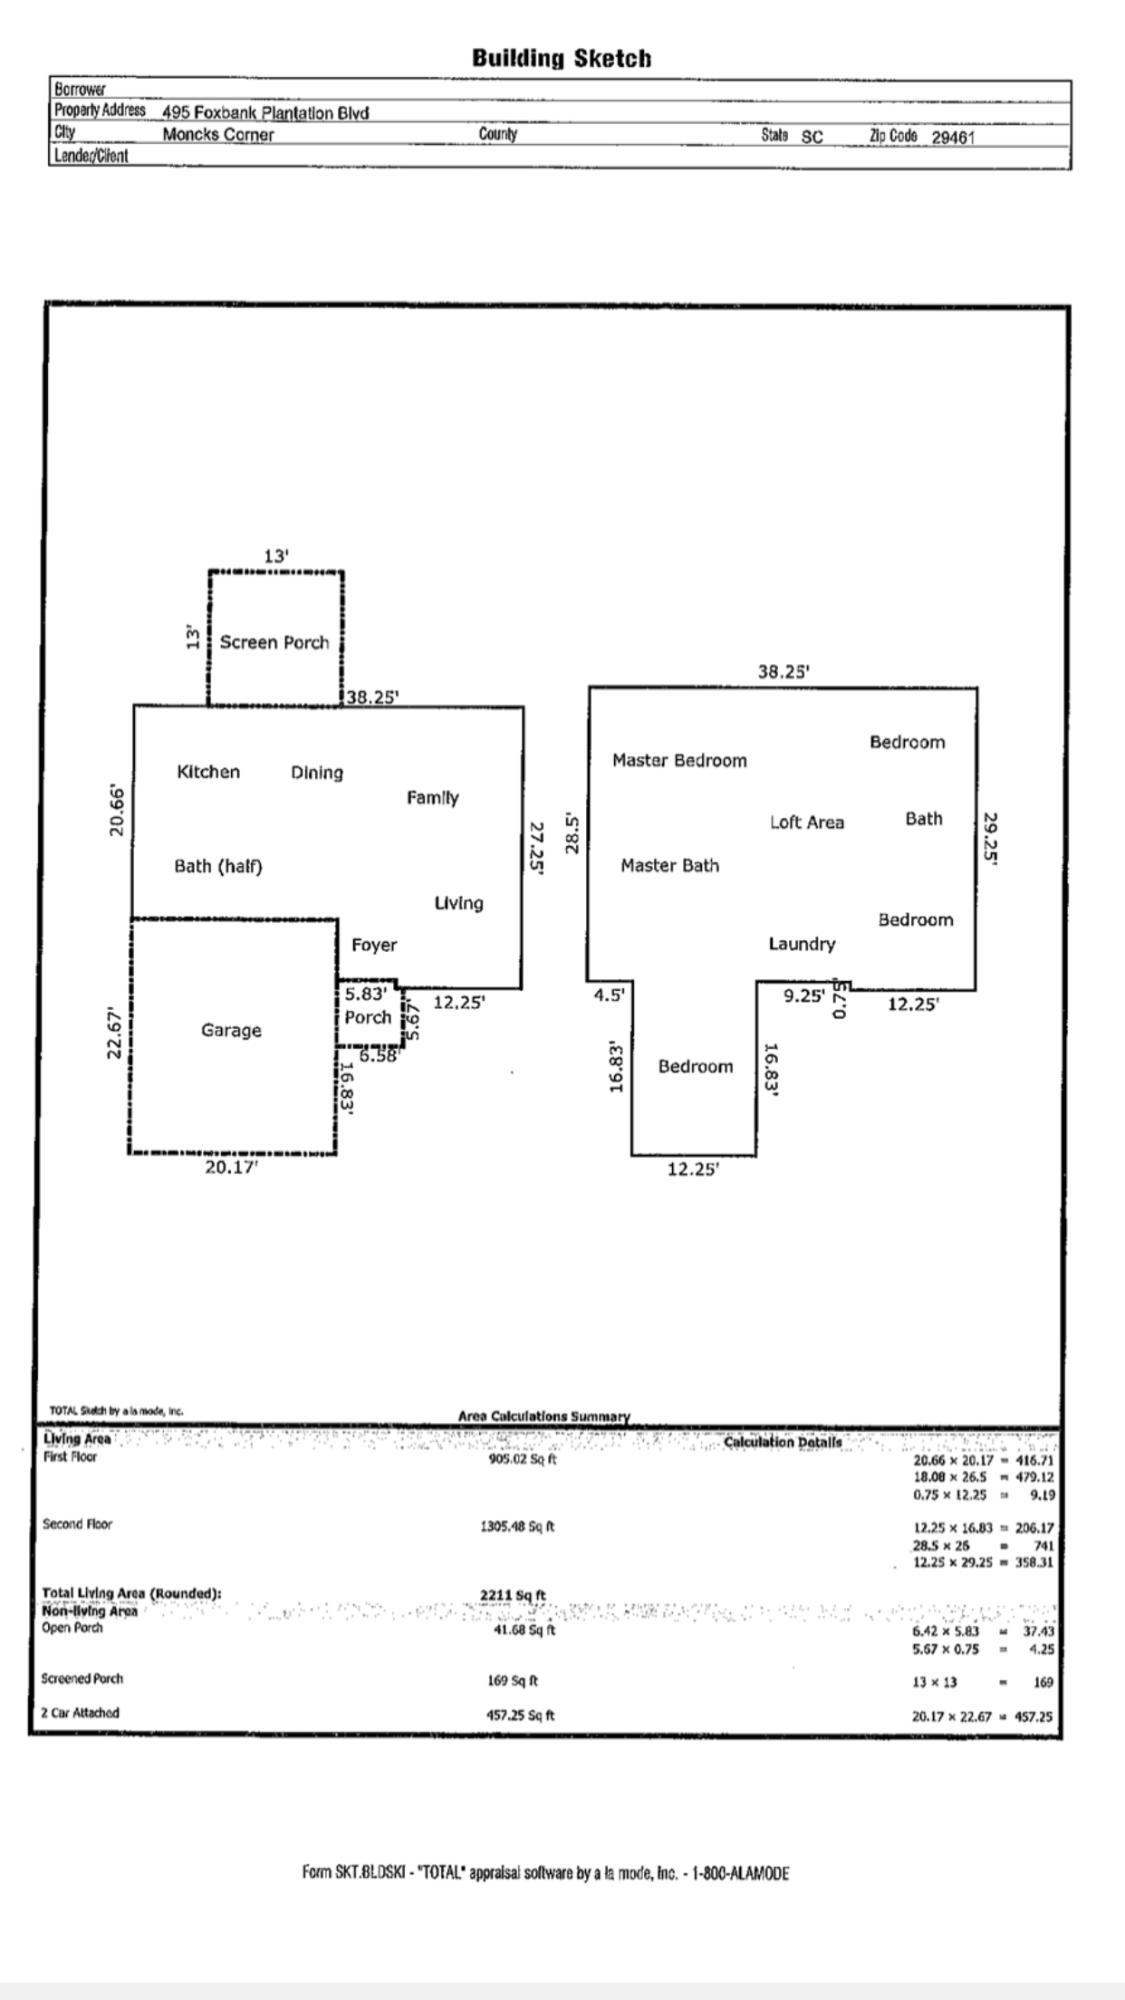 495 Foxbank Plantation Boulevard Moncks Corner, SC 29461